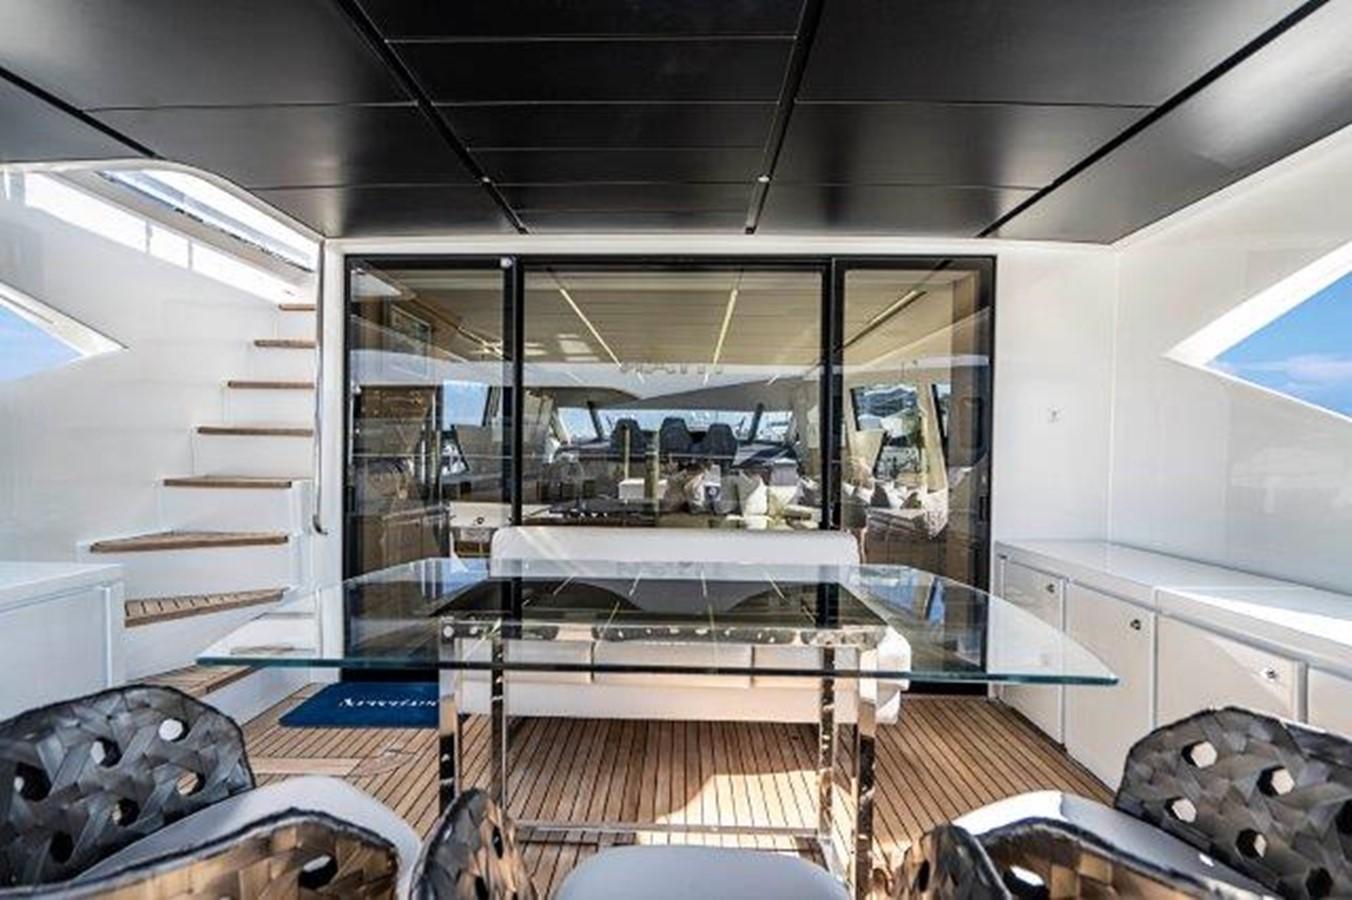 Salon/Aft Deck 2014 PERSHING  Motor Yacht 2431331